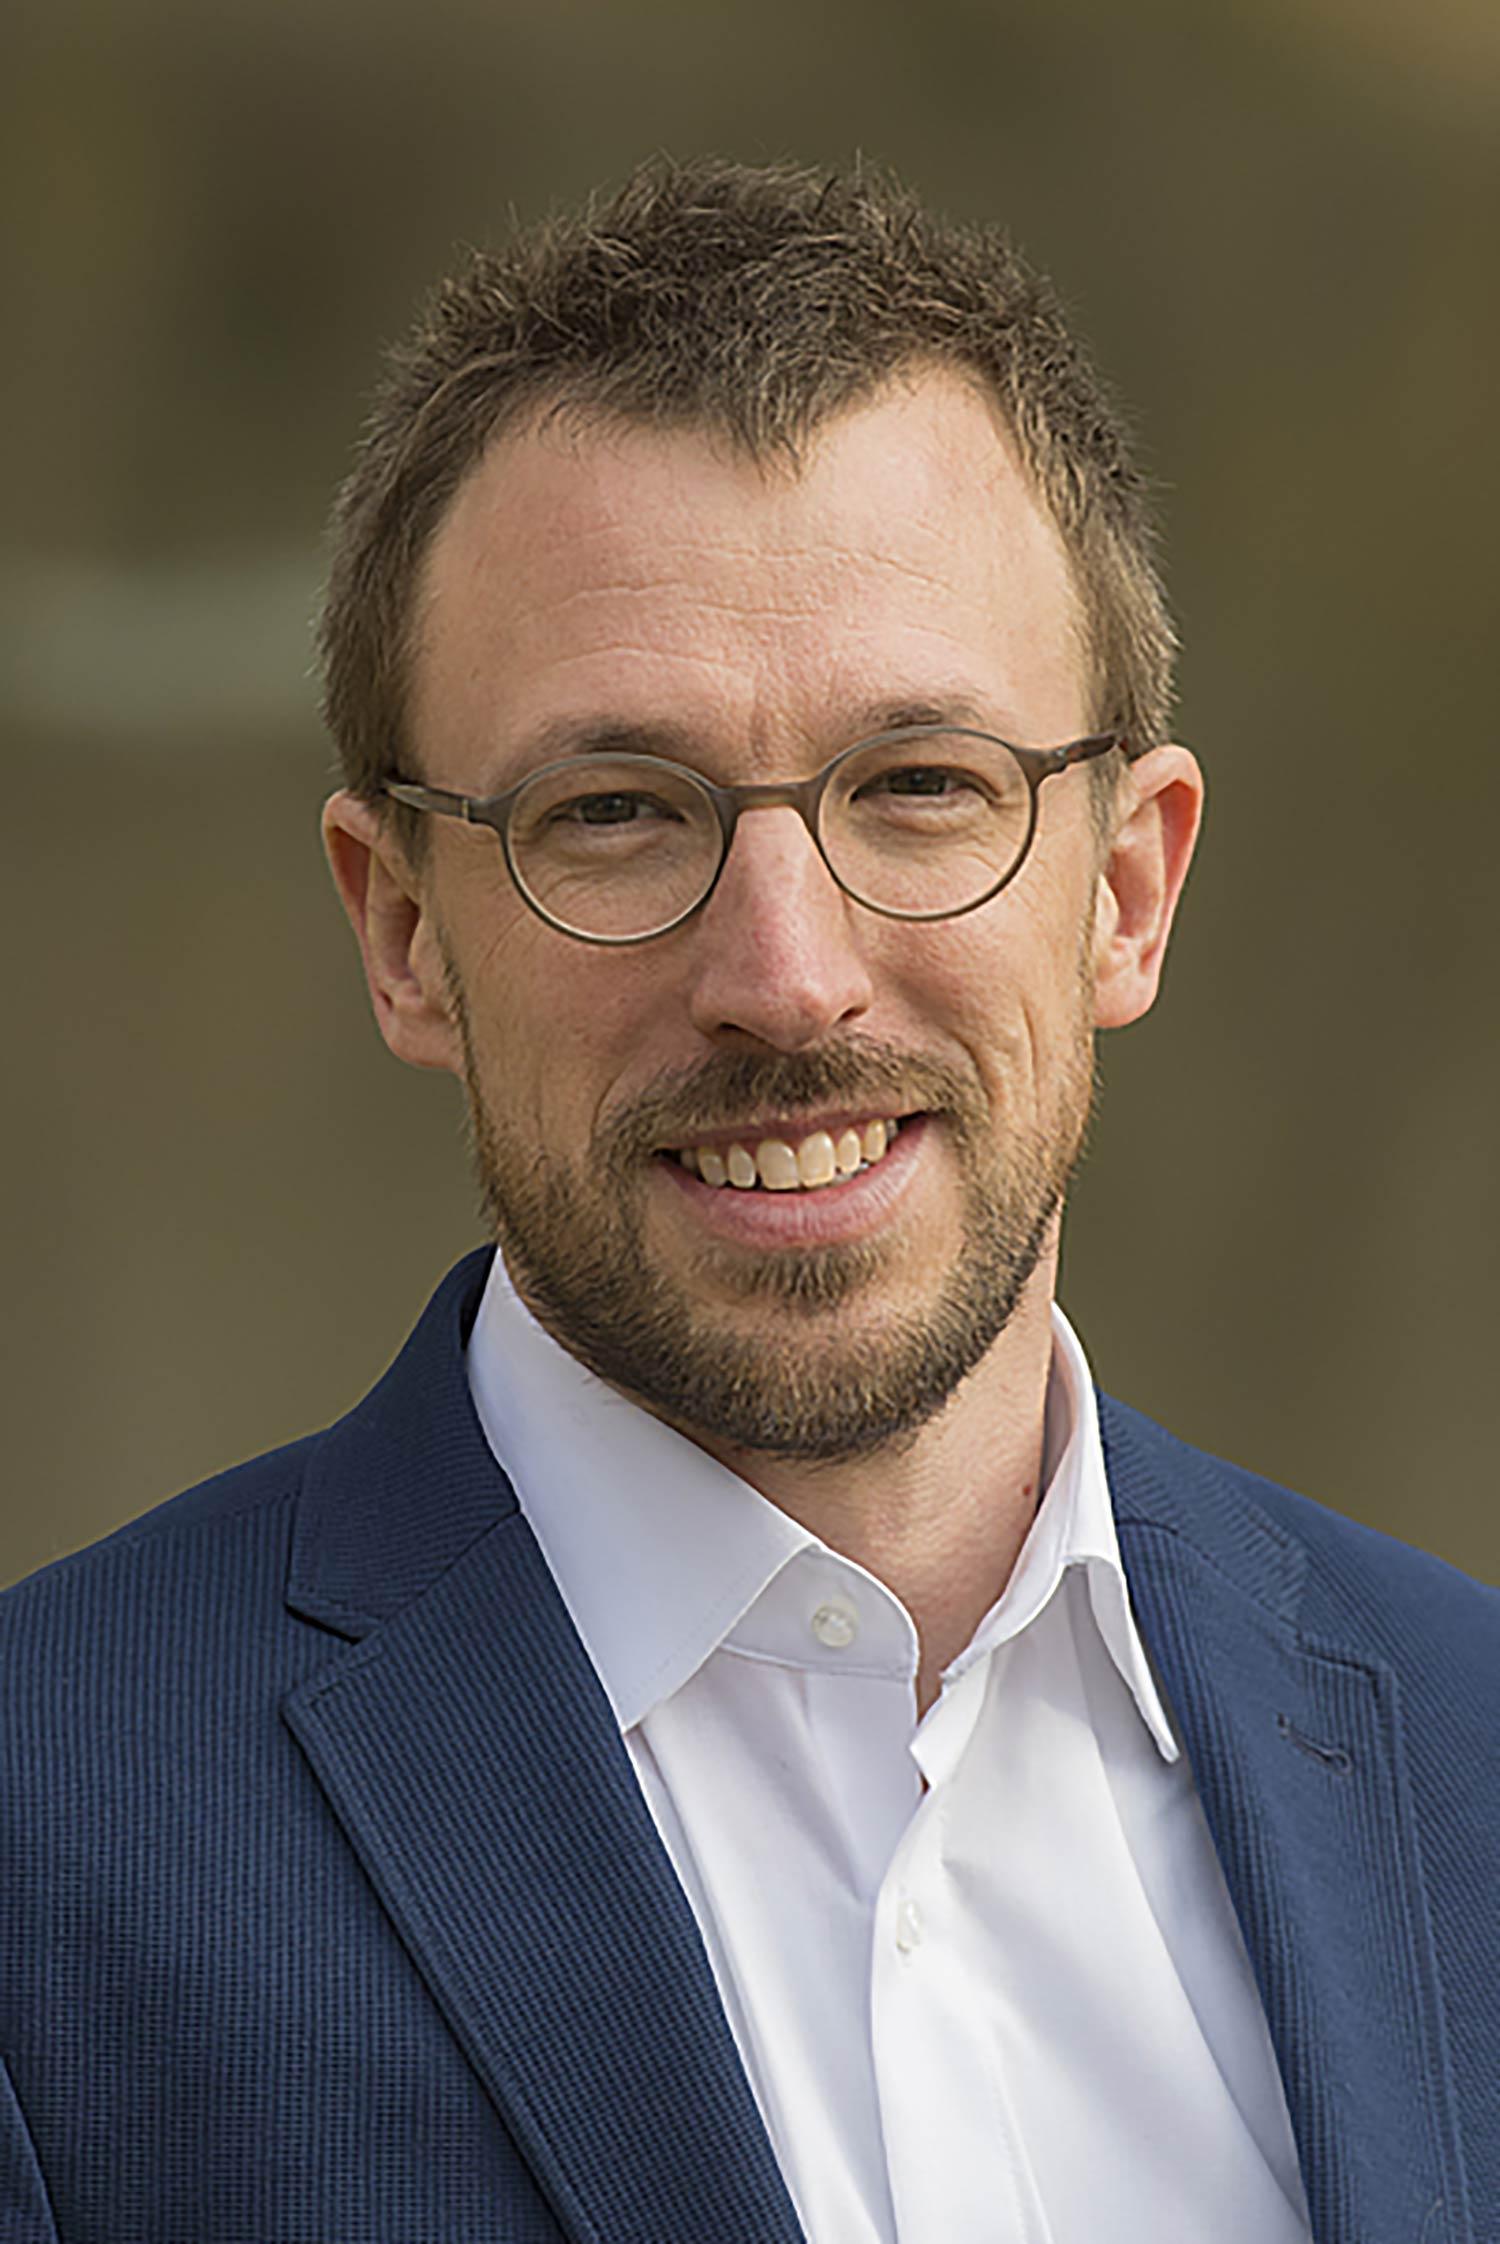 ödp - Benedikt Suttner (39) Grundschullehrer Fotos: ödp